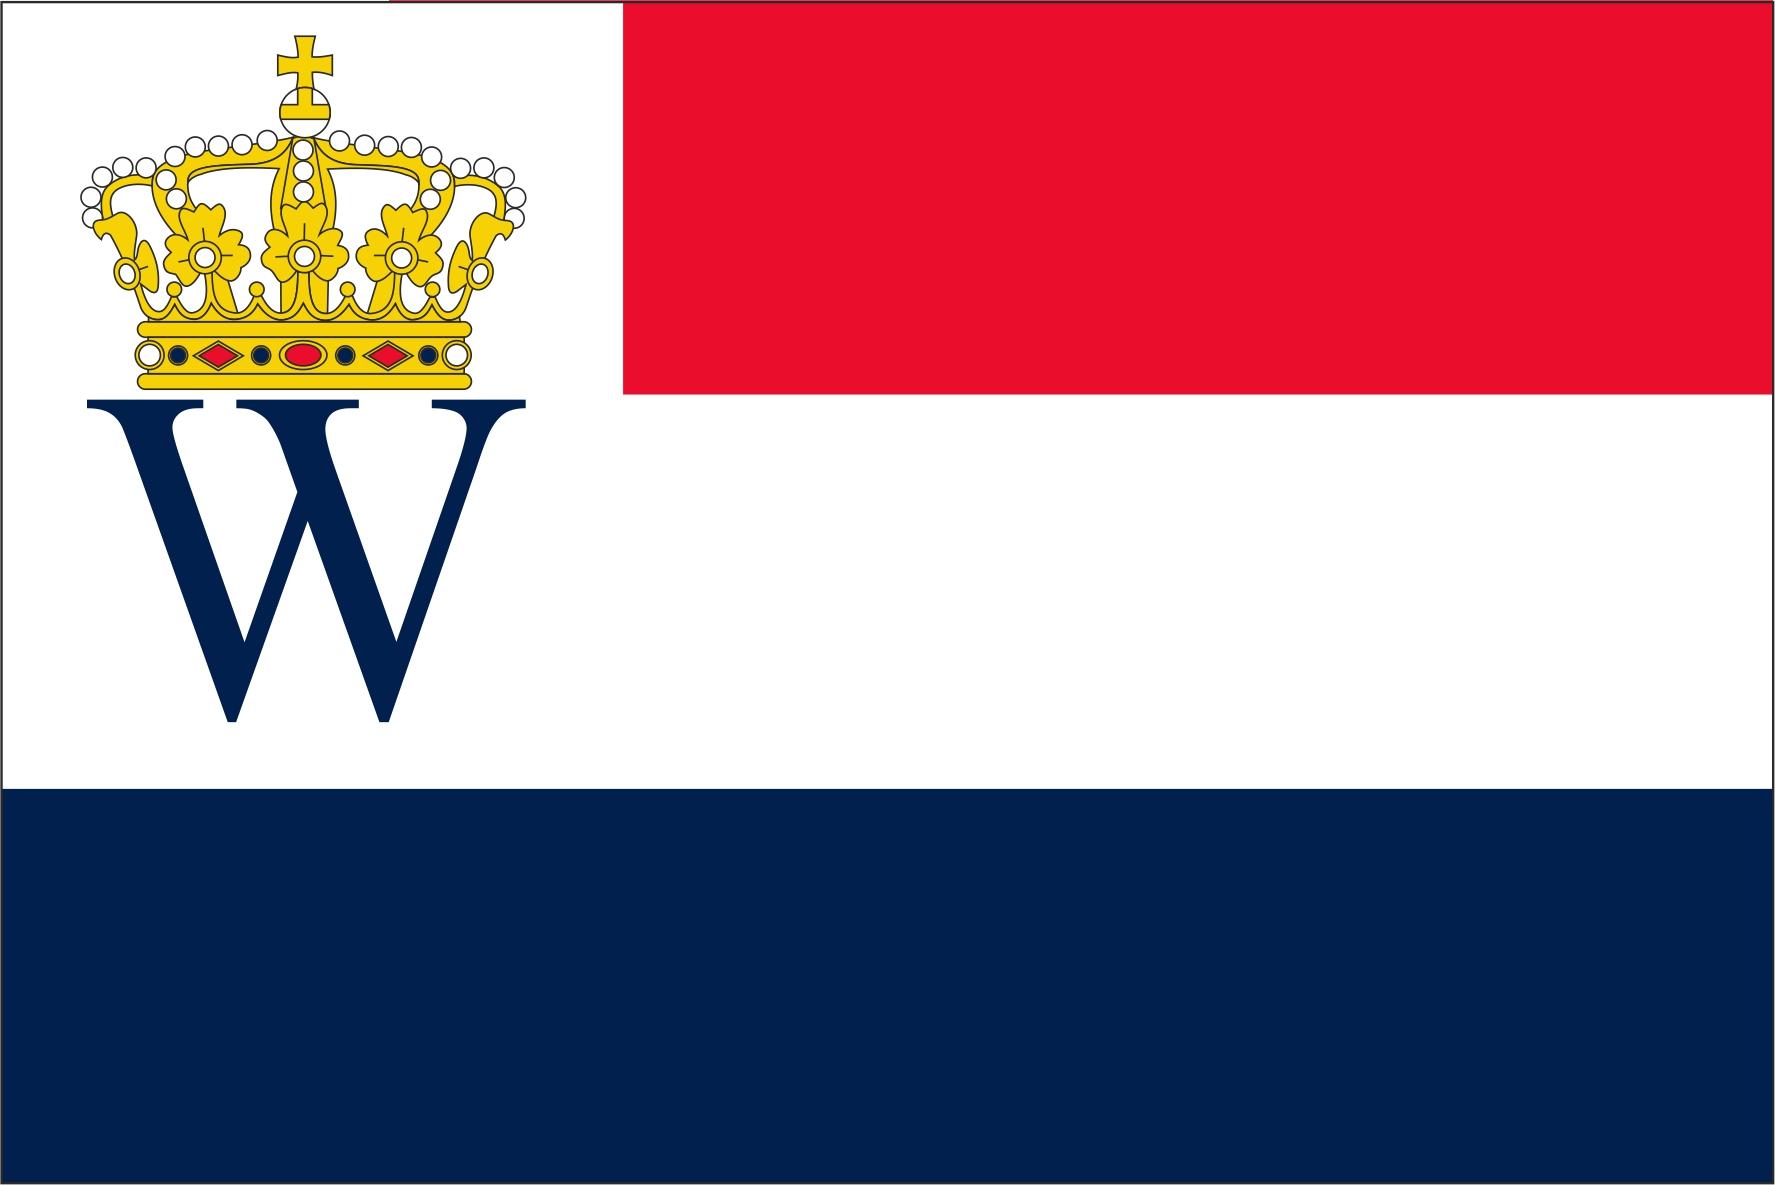 Koninklijke Watersport Vlag 120x180cm Oud Hollands